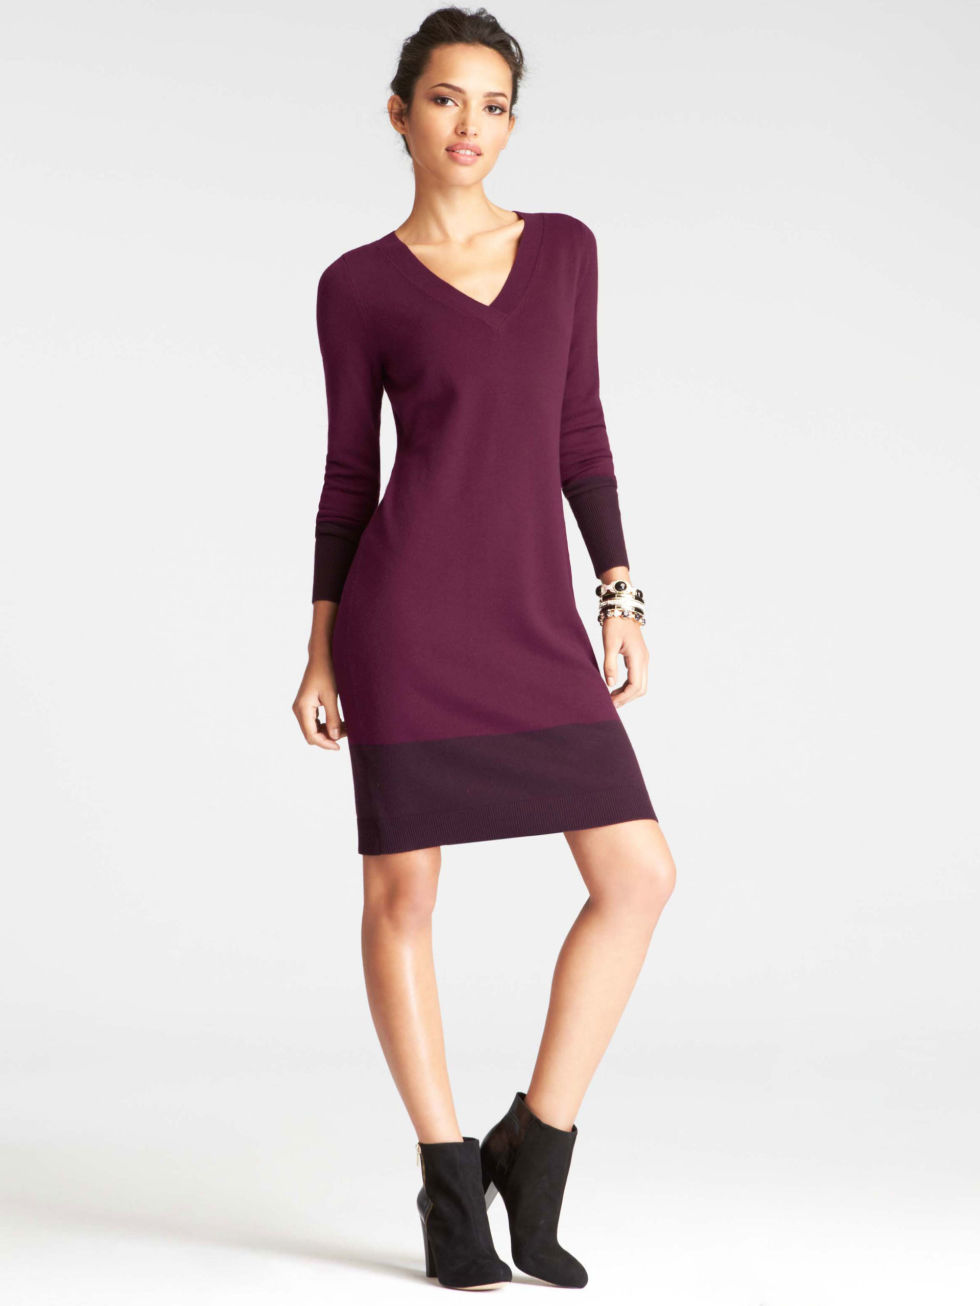 Sweater Dress - Sweater Dresses for Women